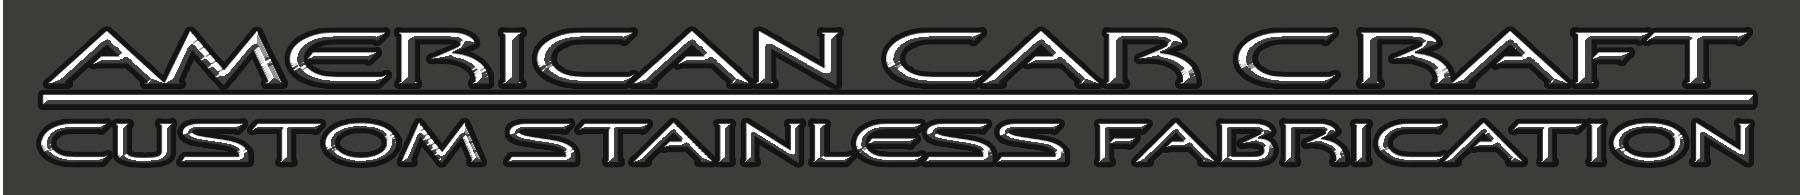 acc-logo-jpg